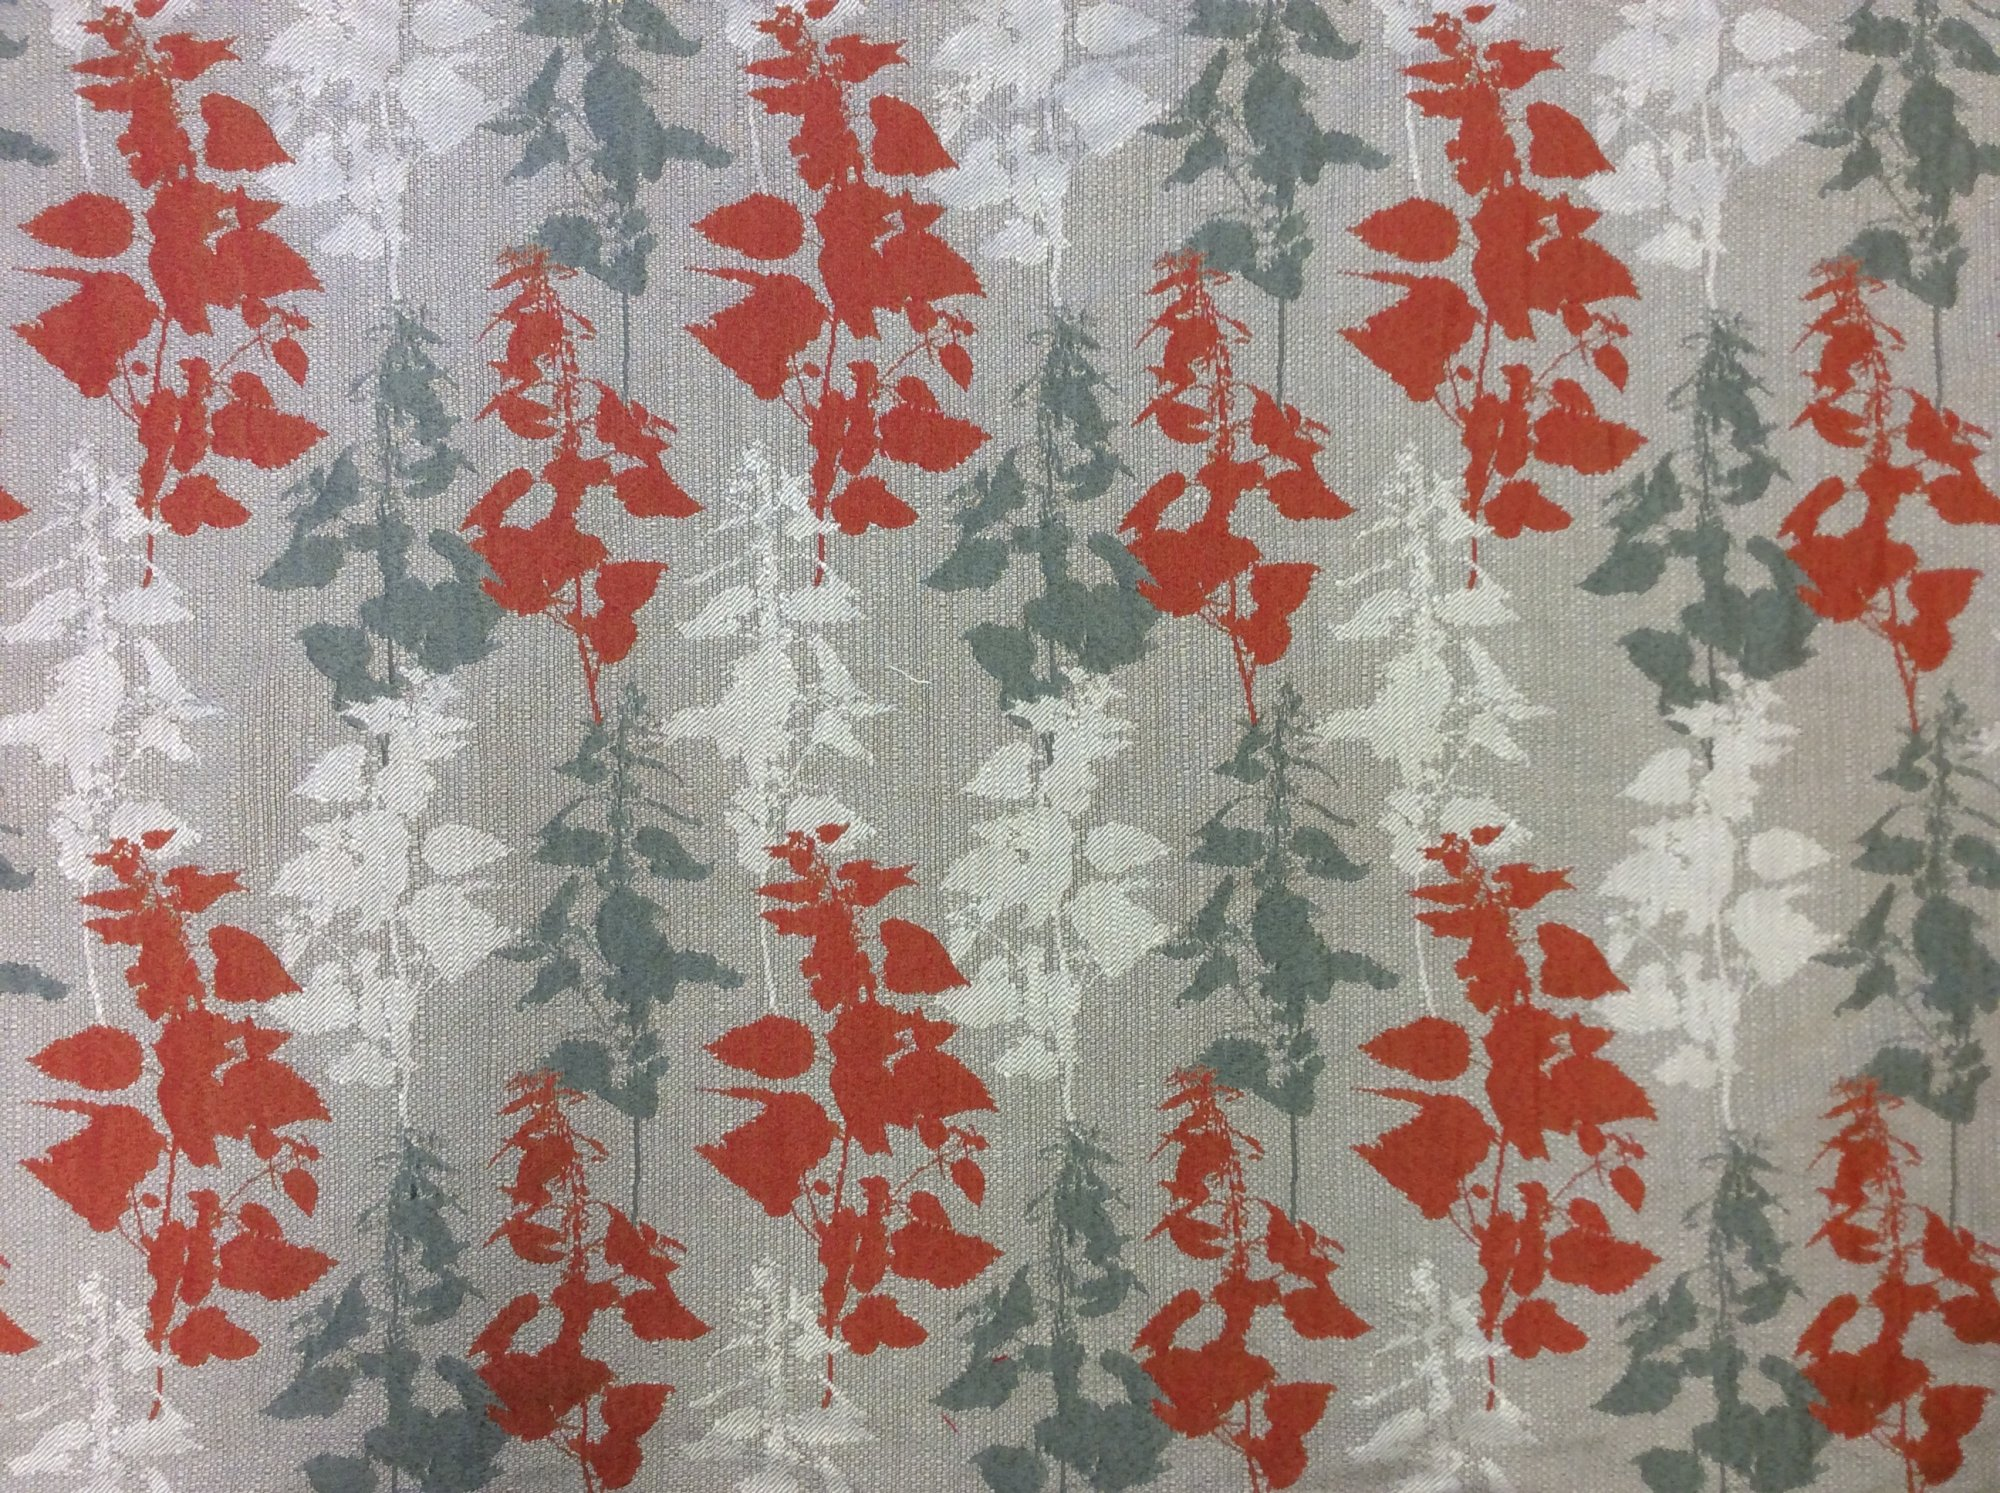 Woven Jacquard Modern Leaf Silhouette Fabric HD679